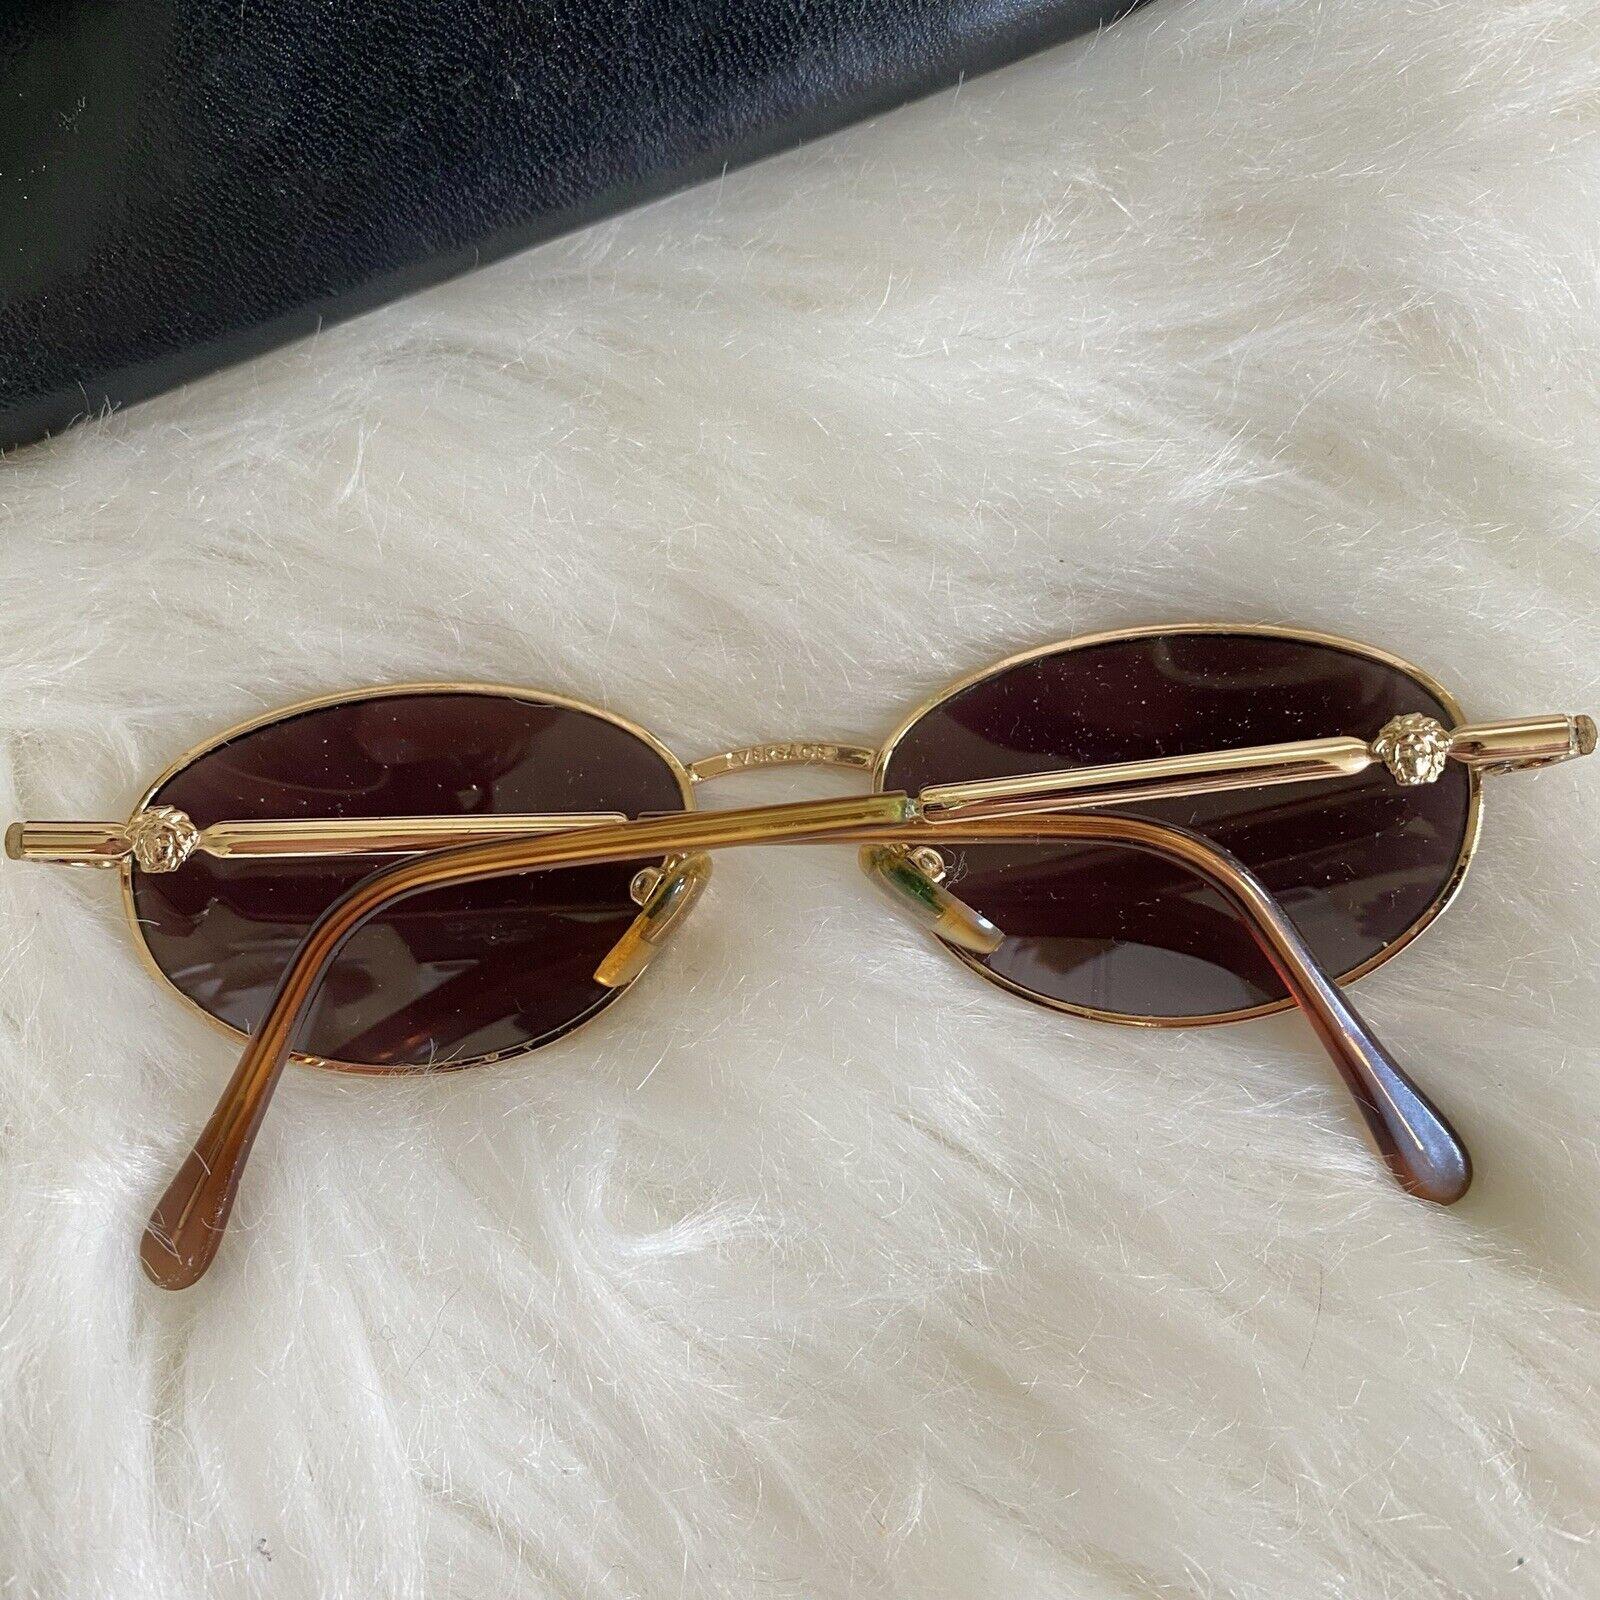 Vintage Gianni Versace Mod H35 COL 030 sunglasses - image 3